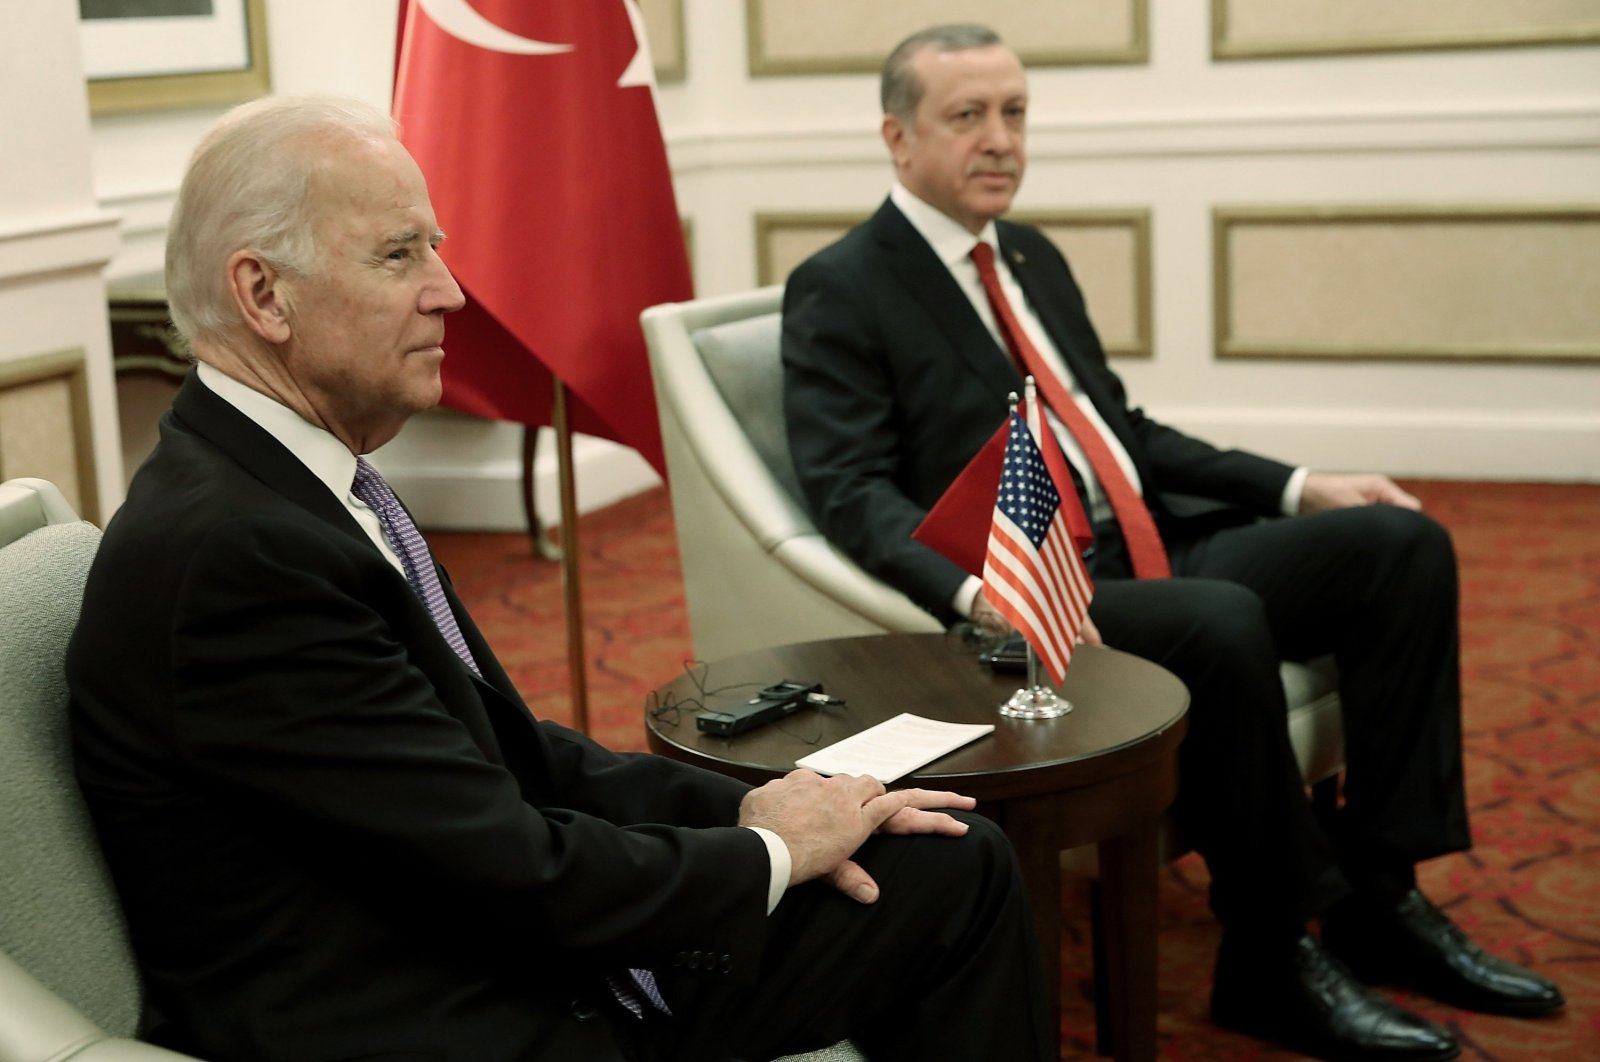 U.S. then-Vice President Joe Biden (L) meets with Turkish President Recep Tayyip Erdoğan in Washington, D.C., U.S., March 31, 2016. (Getty Images)